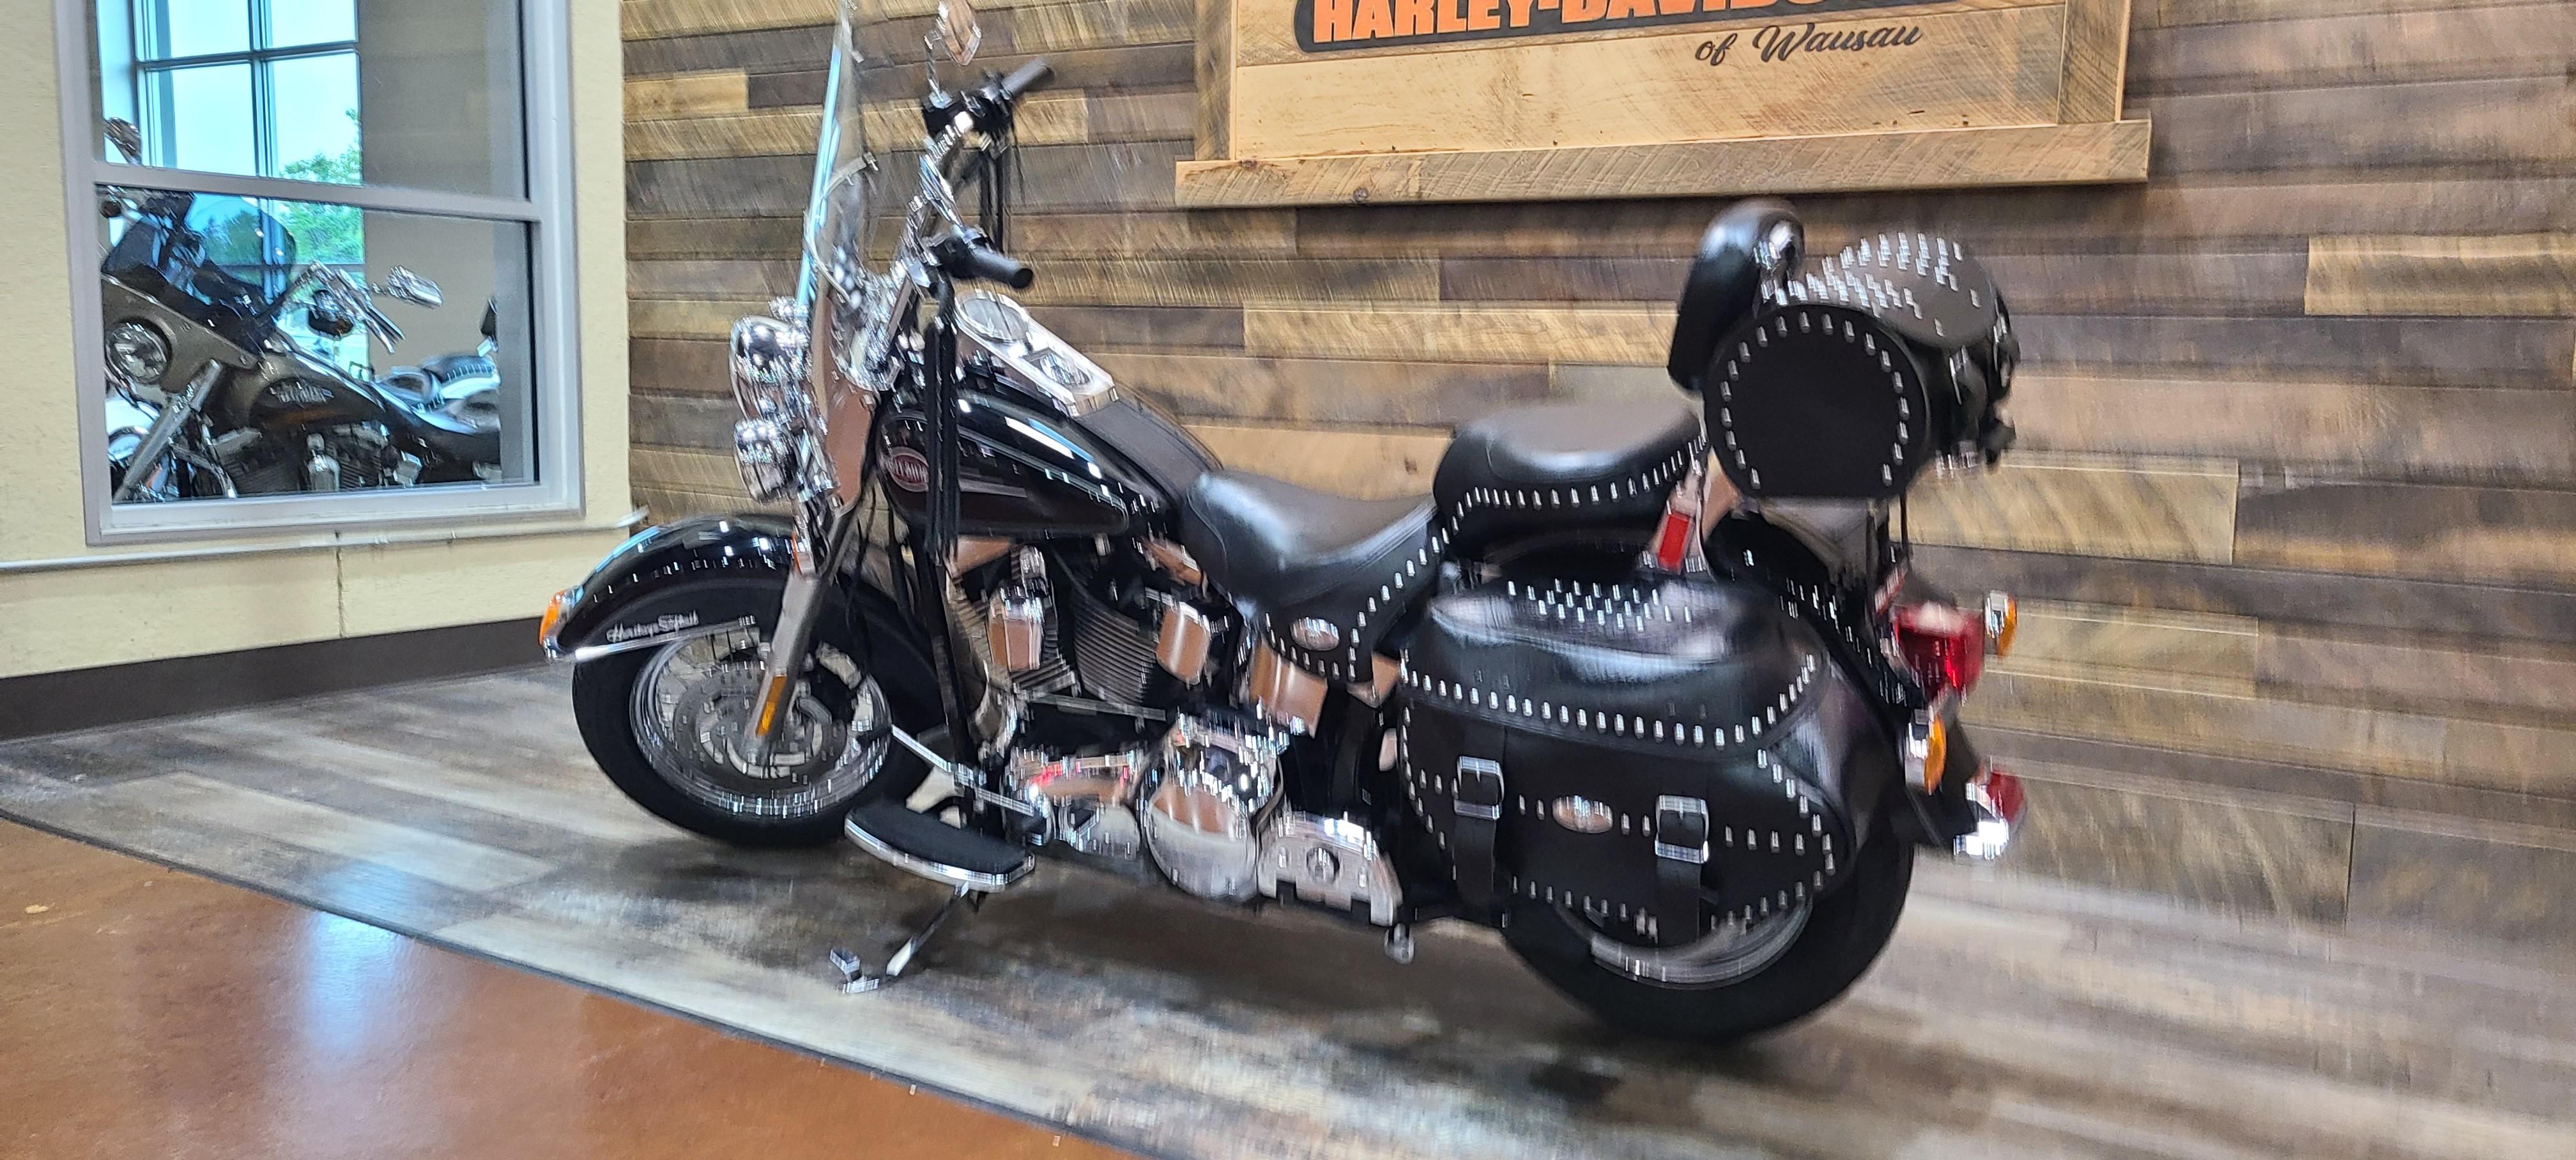 2006 Harley-Davidson Softail Heritage Softail Classic at Bull Falls Harley-Davidson